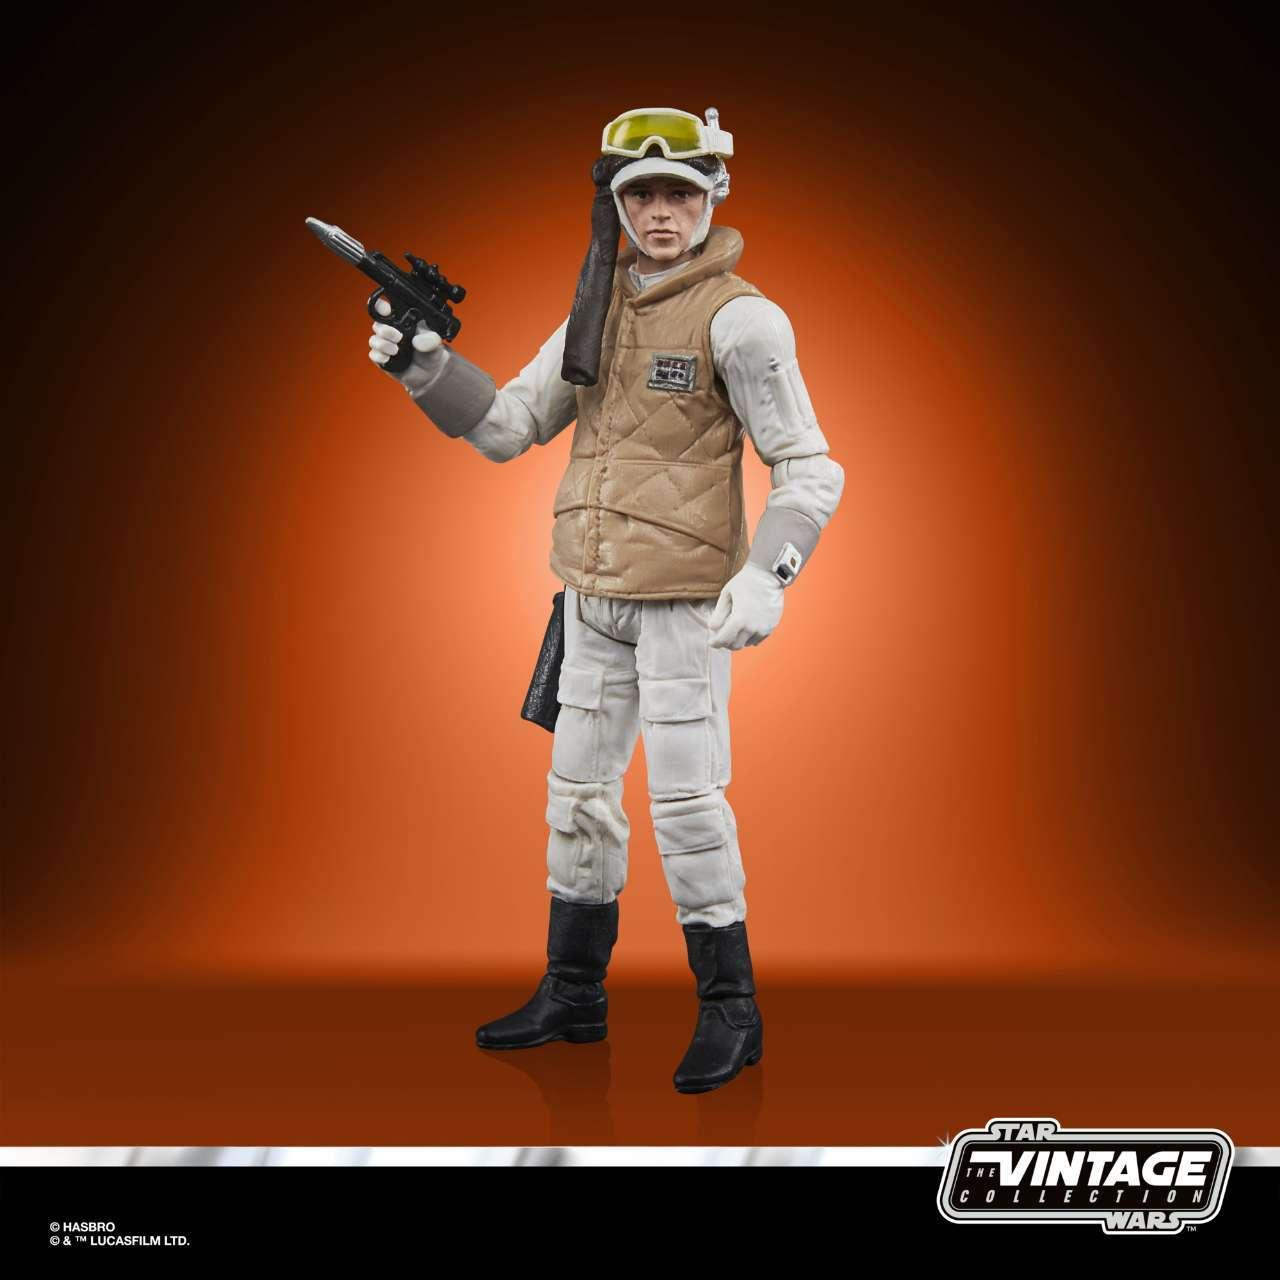 STAR WARS THE VINTAGE COLLECTION 375-INCH REBEL SOLDIER (ECHO BASE BATTLE GEAR) Figure - oop (1)